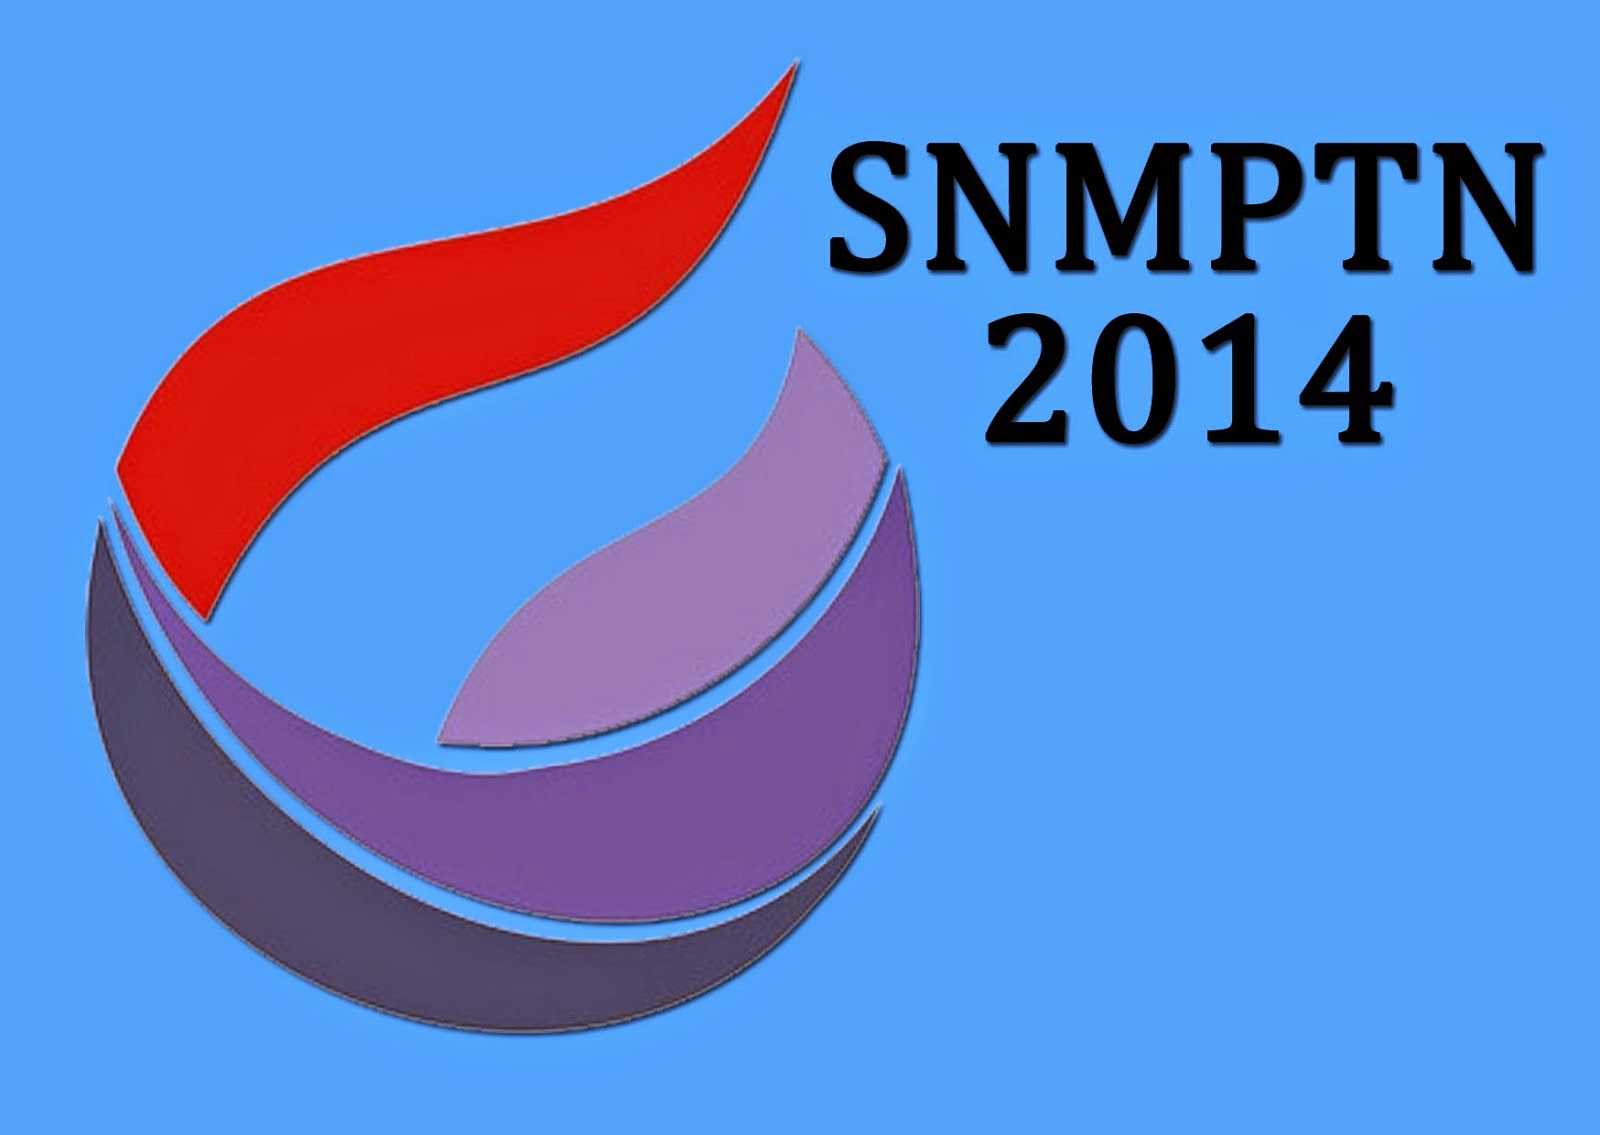 Informasi Pengumuman SNMPTN 2014 Kata Kata Bijak